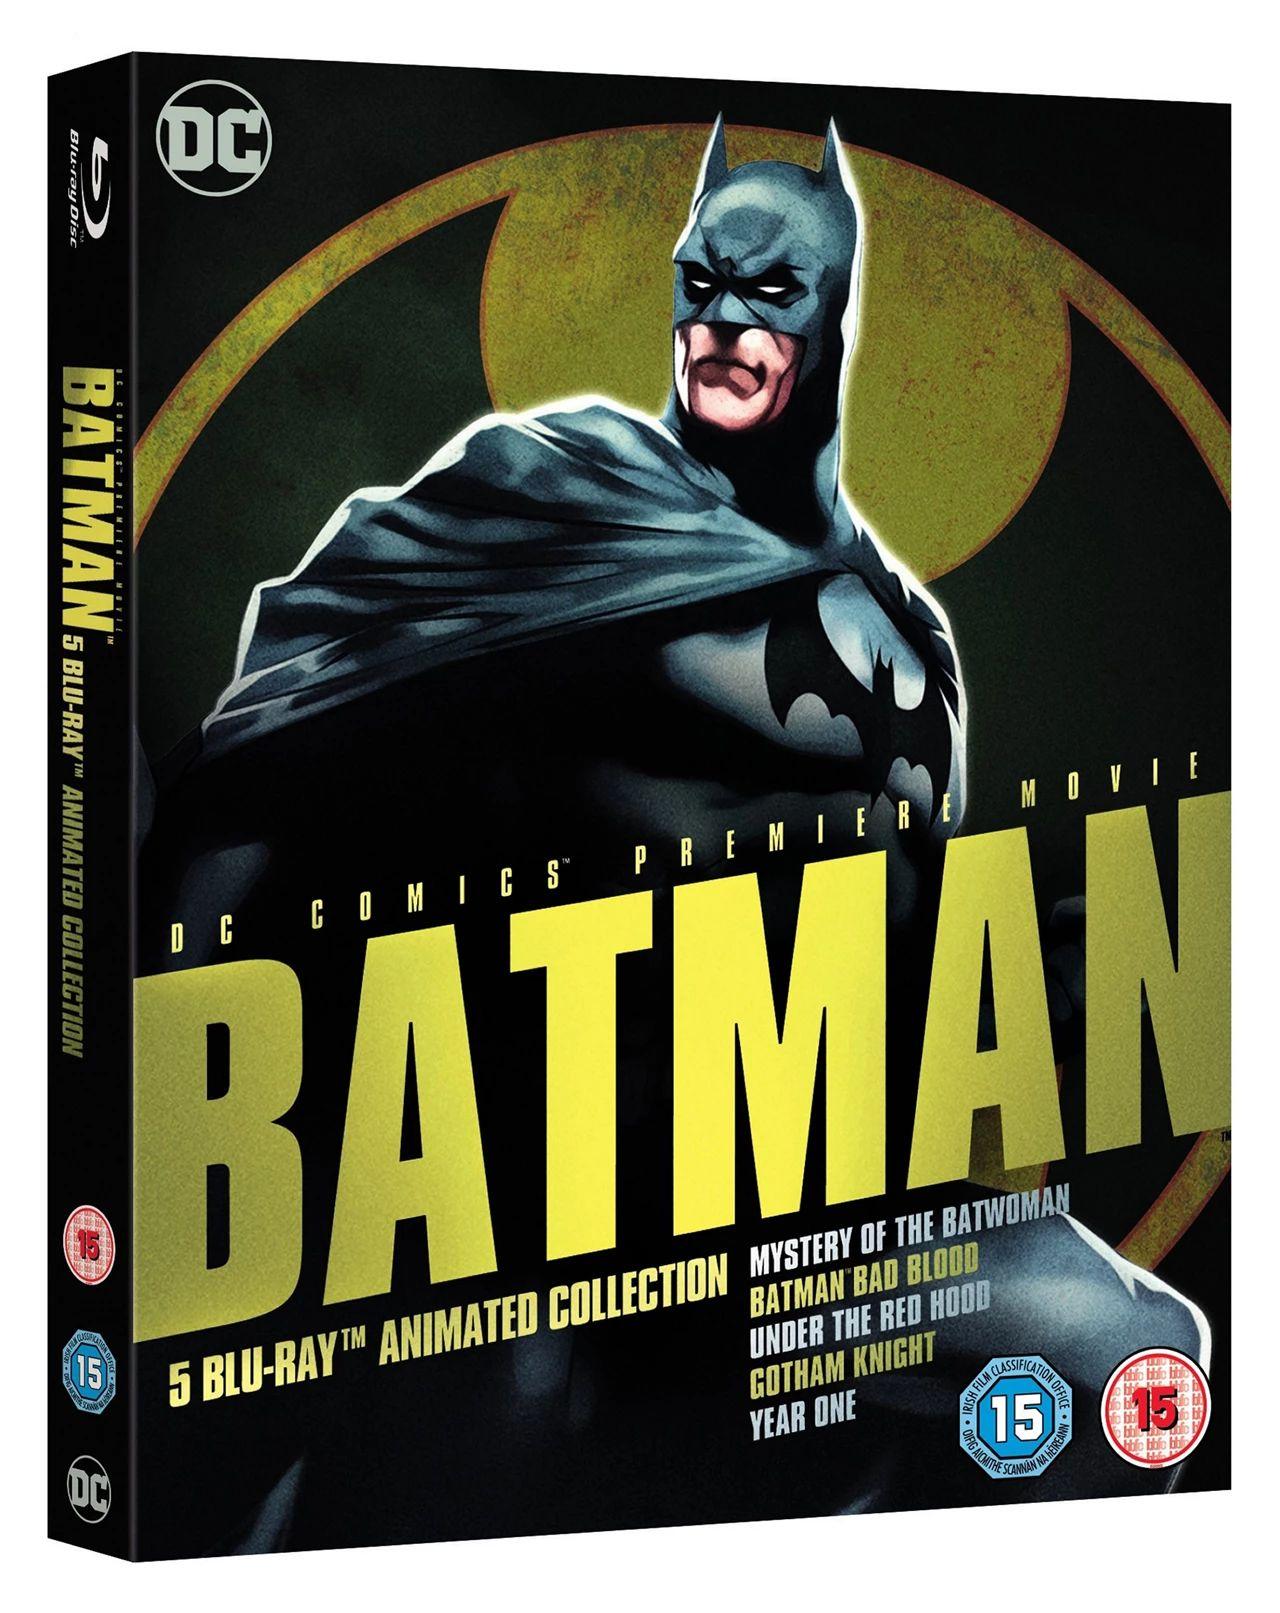 Batman:Animated collection blu ray £9.99 @ cardboardstory4/eBay